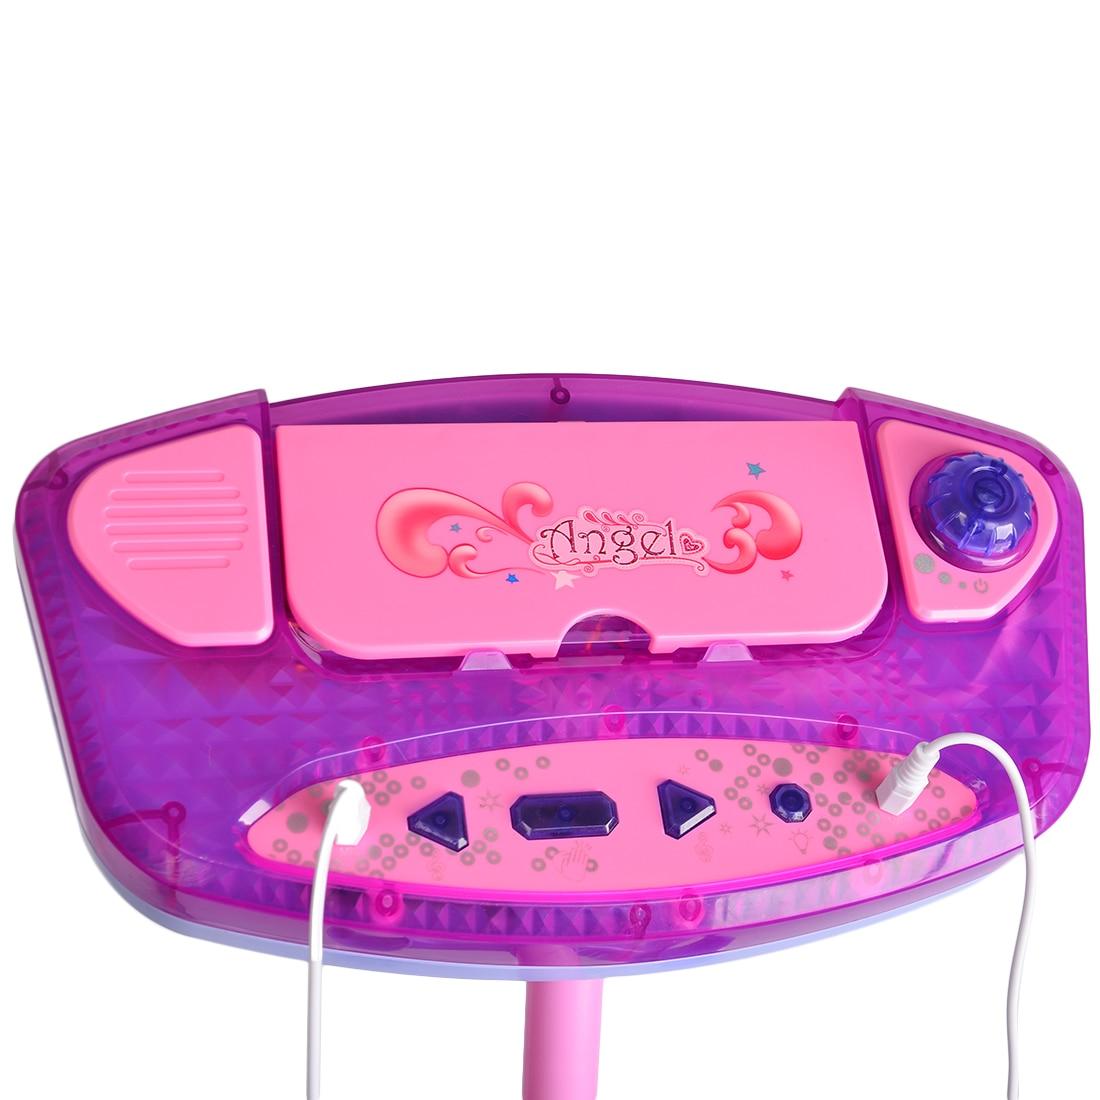 Karaoke Christmas Musical.Kids Girls Microphone Mic Karaoke Singing Machine Kid Funny Gift Music Toy Excellent Toy Musical Instrument Christmas Gift